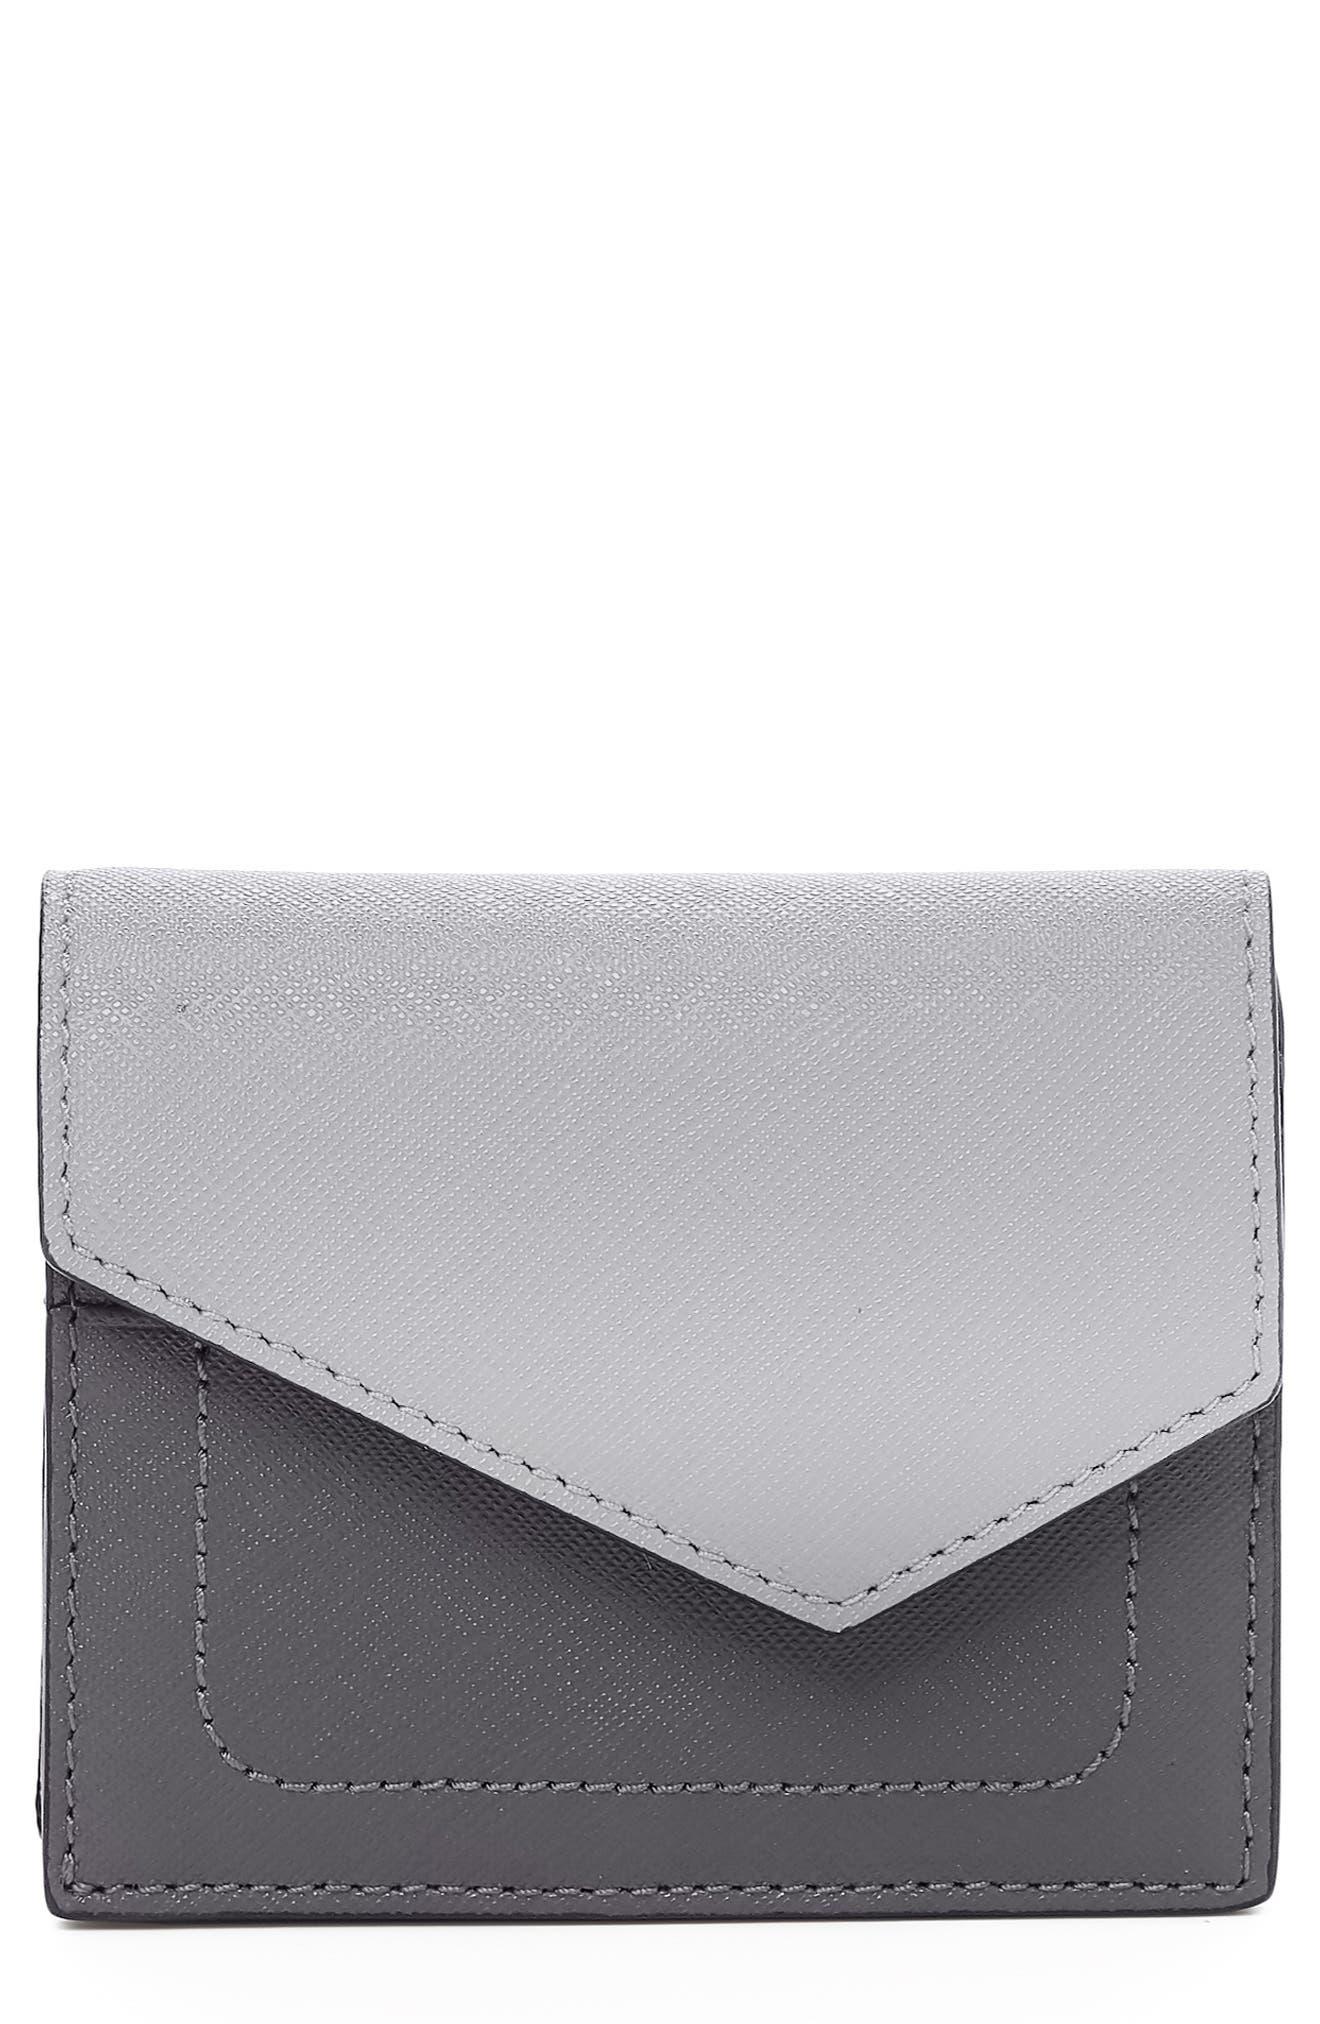 BOTKIER,                             Mini Cobble Hill Colorblock Leather Wallet,                             Main thumbnail 1, color,                             PEWTER COMBO